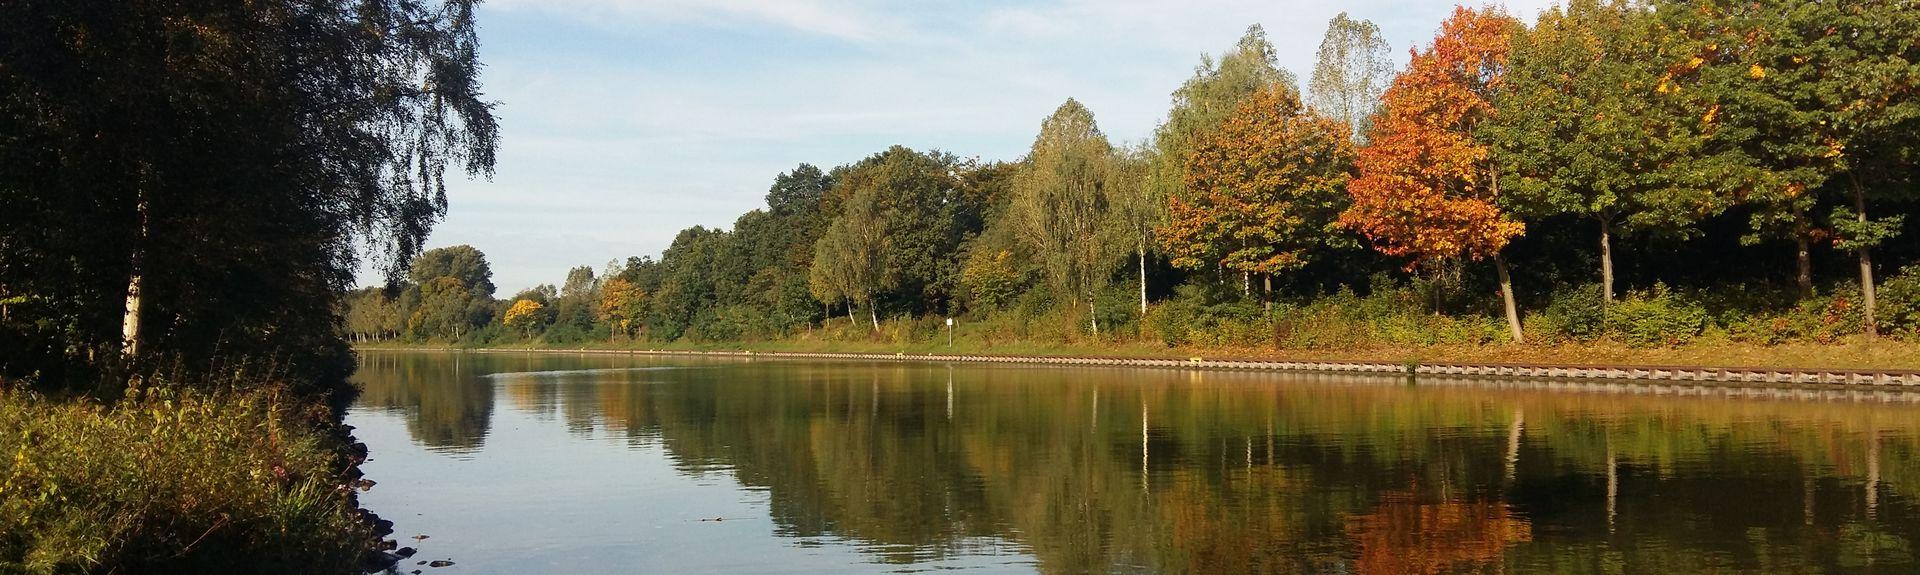 Gelsenkirchen, Renânia do Norte-Vestfália, Alemanha